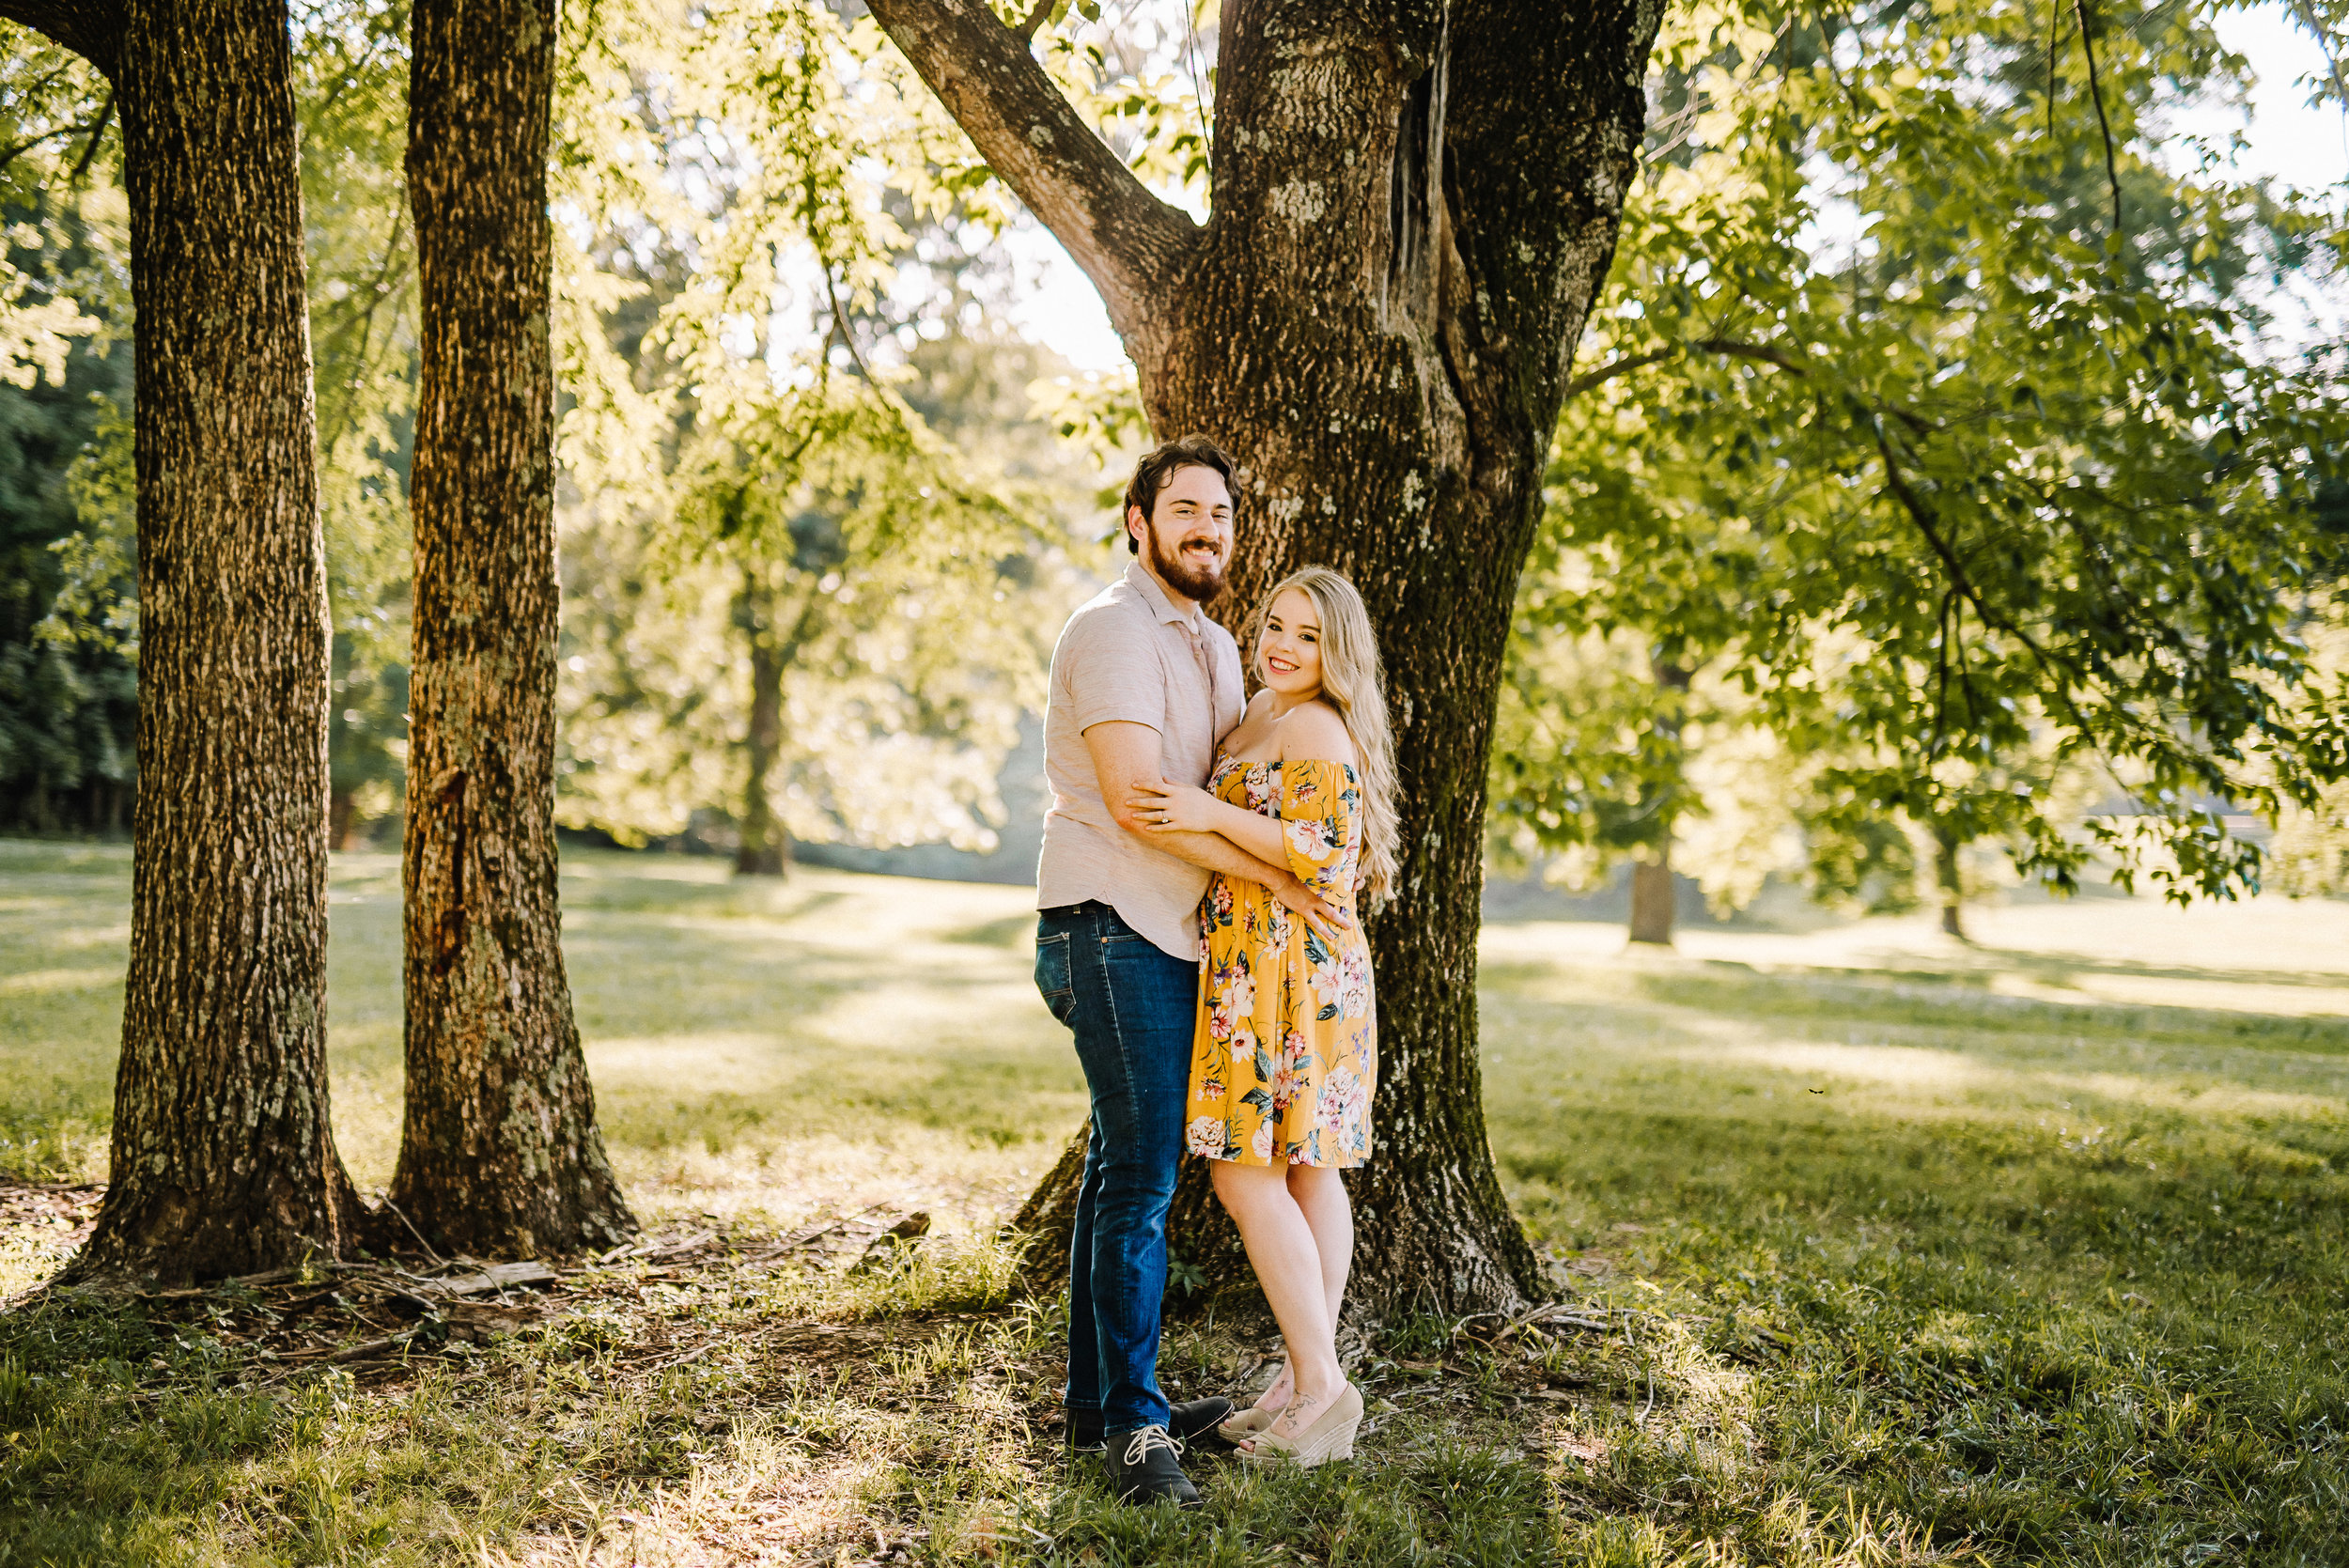 Maddie & Ryan_Shelby Farms_Martyrs Park_Ashley Benham Photography-56.jpg